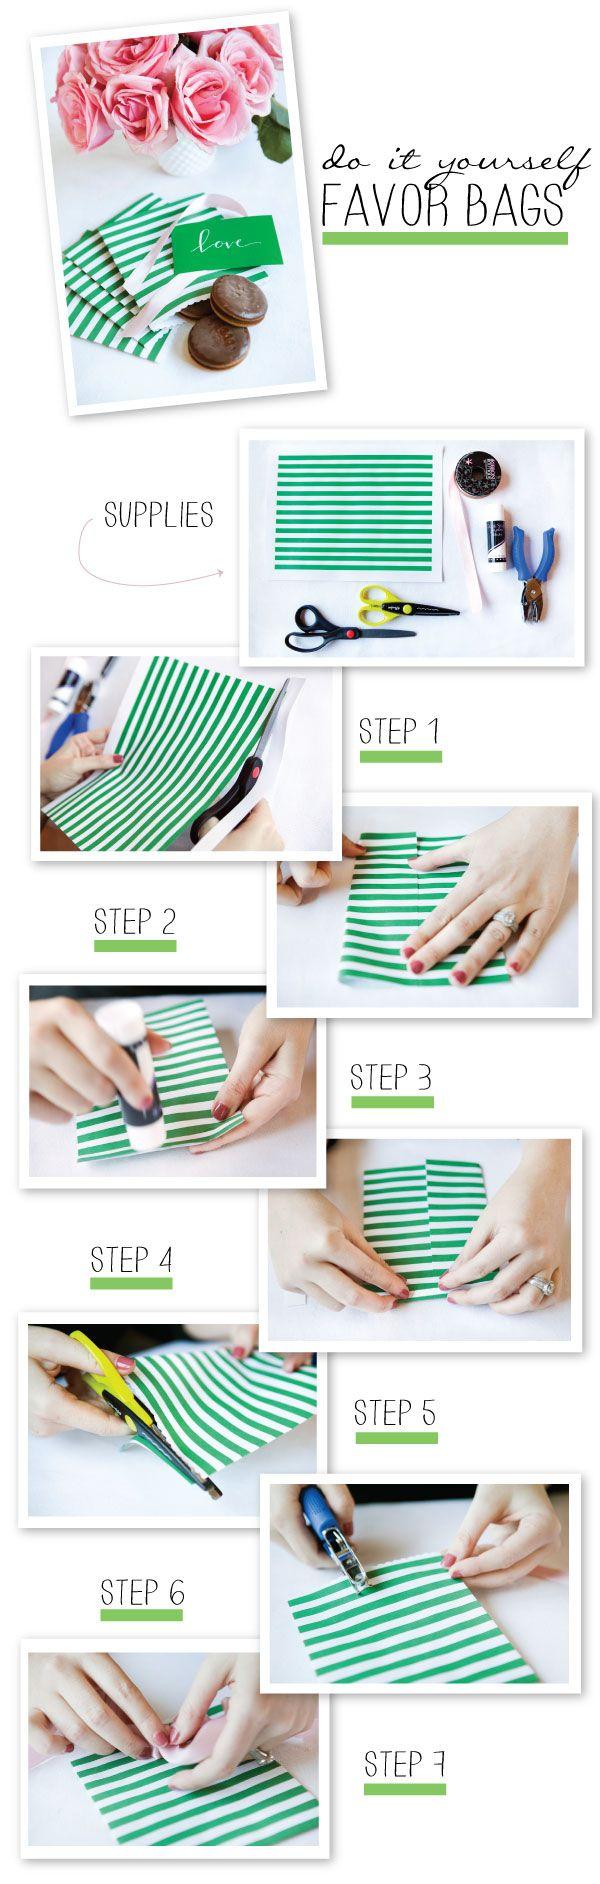 Wrap It Up Pretty + Winners + DIY Favor Bags! | Favor bags, Favors ...